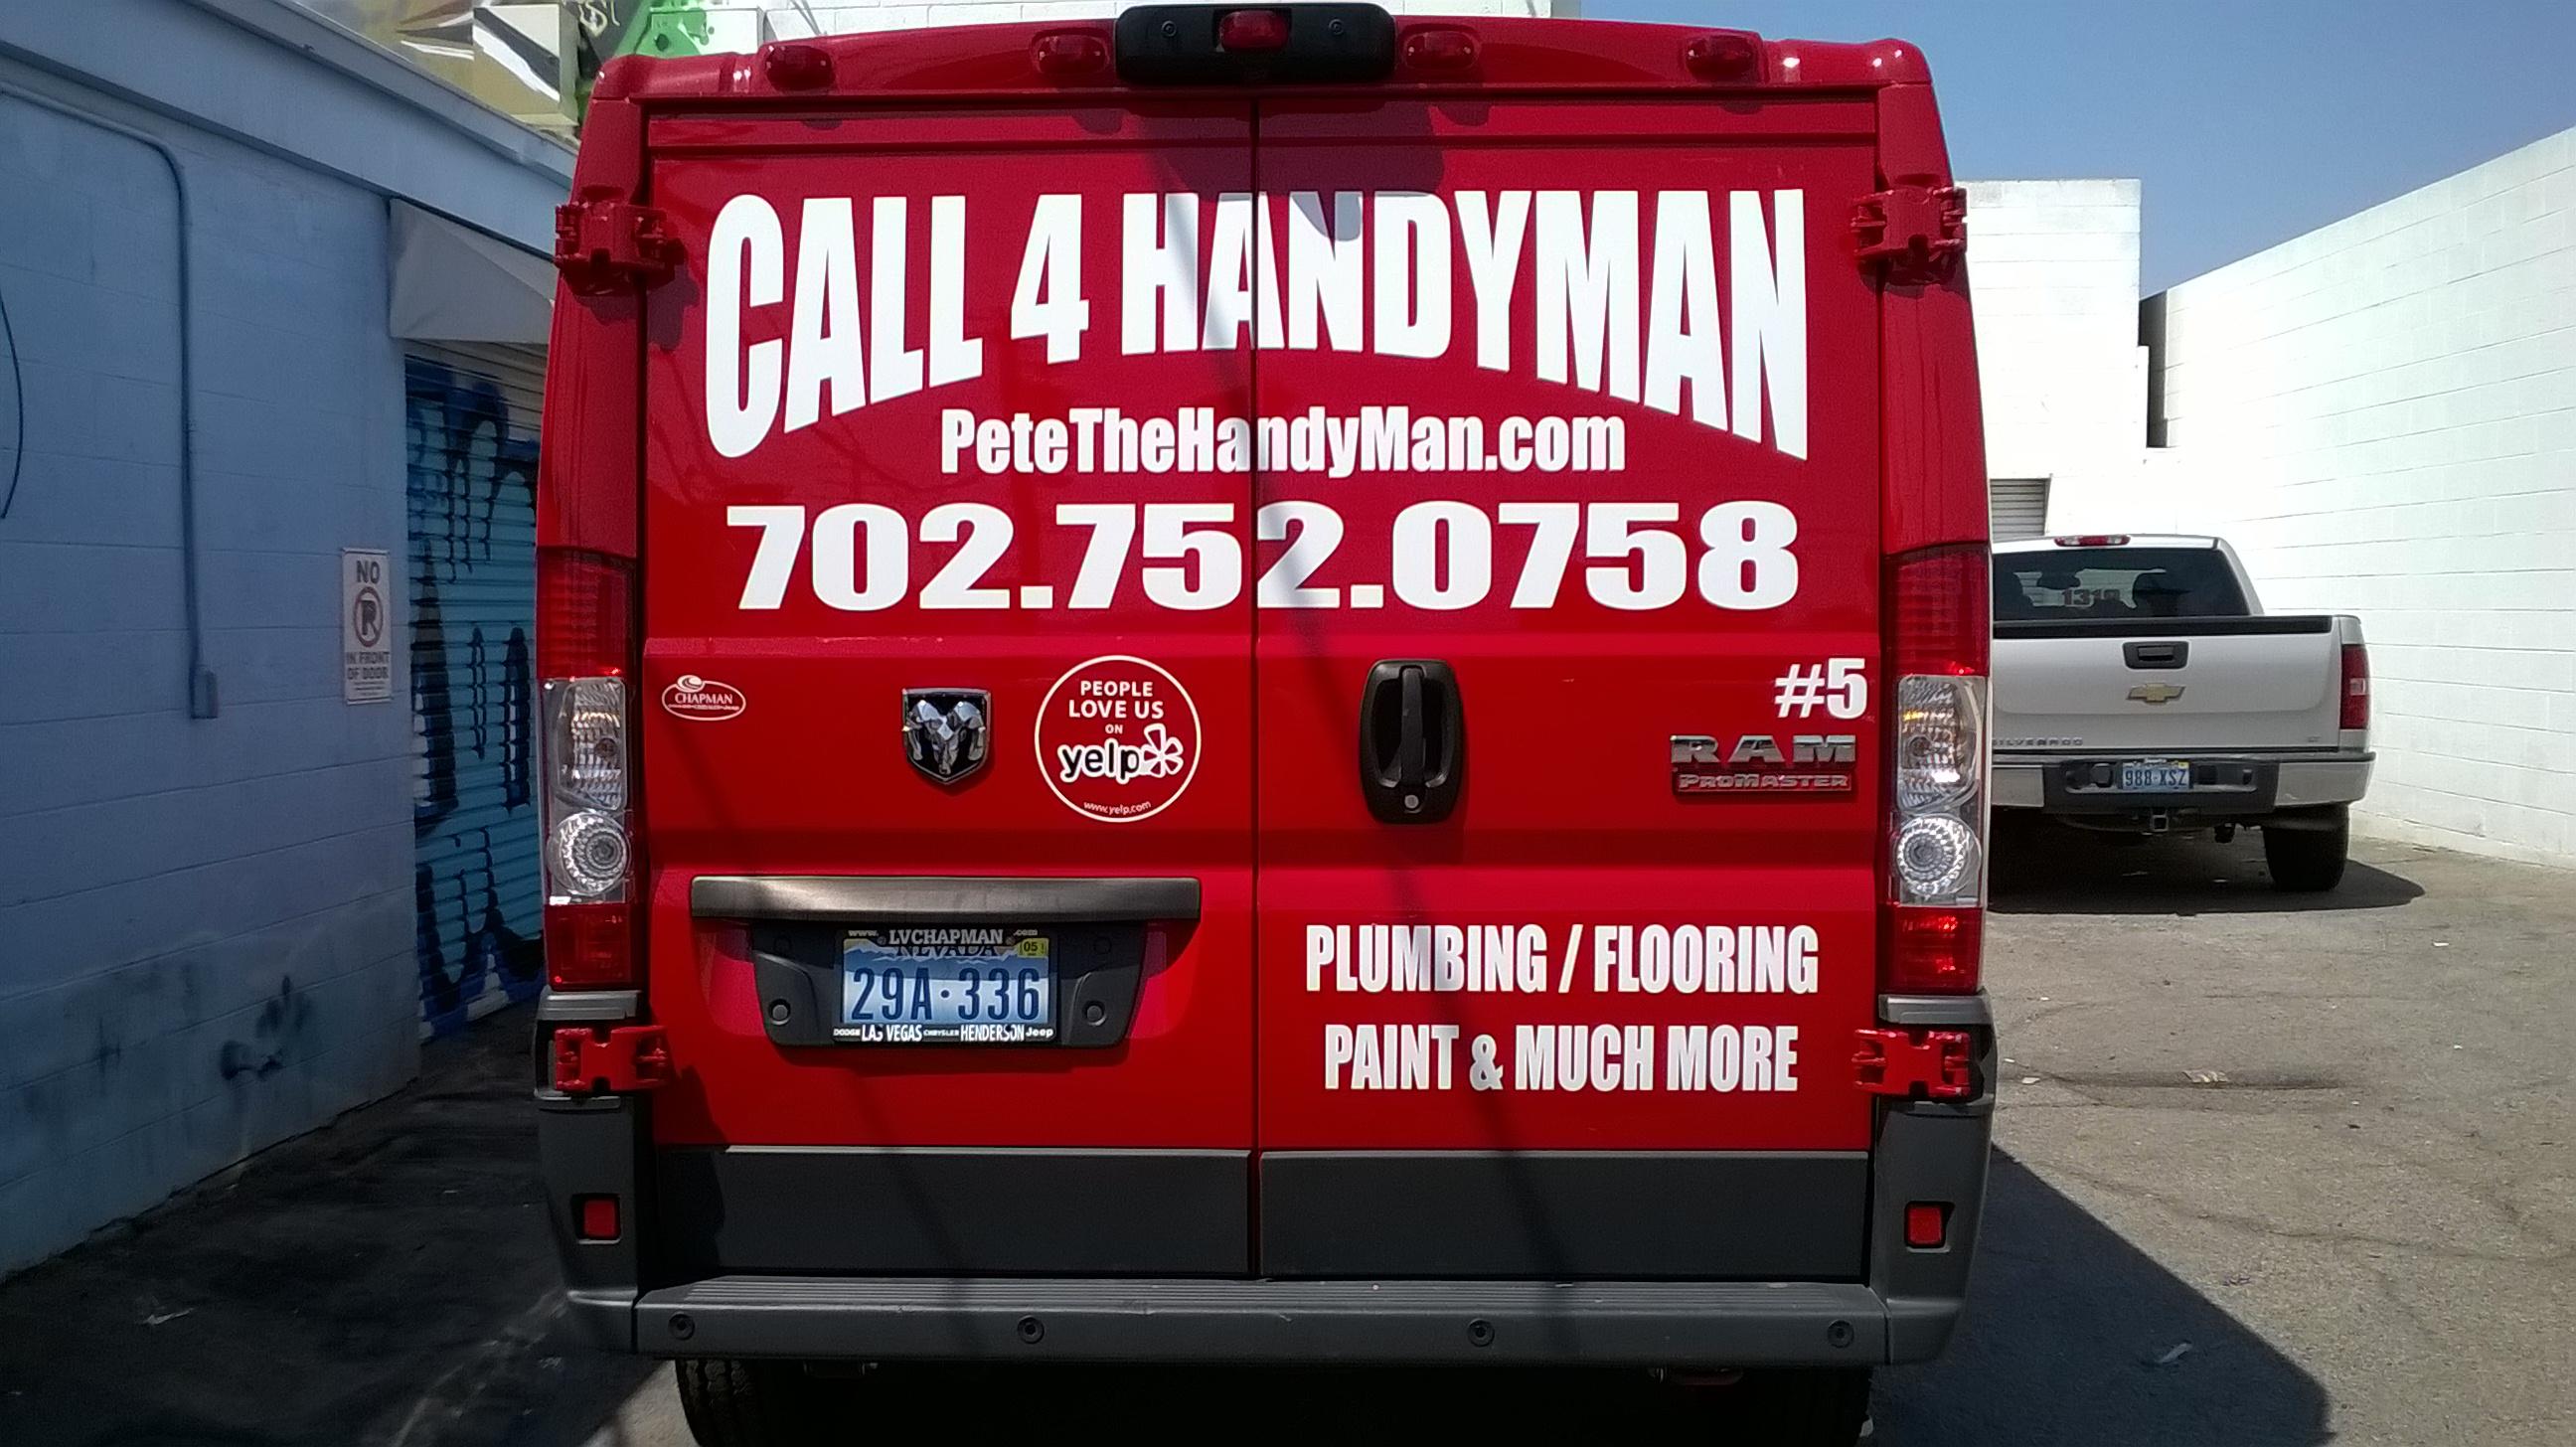 Call 4 Handyman